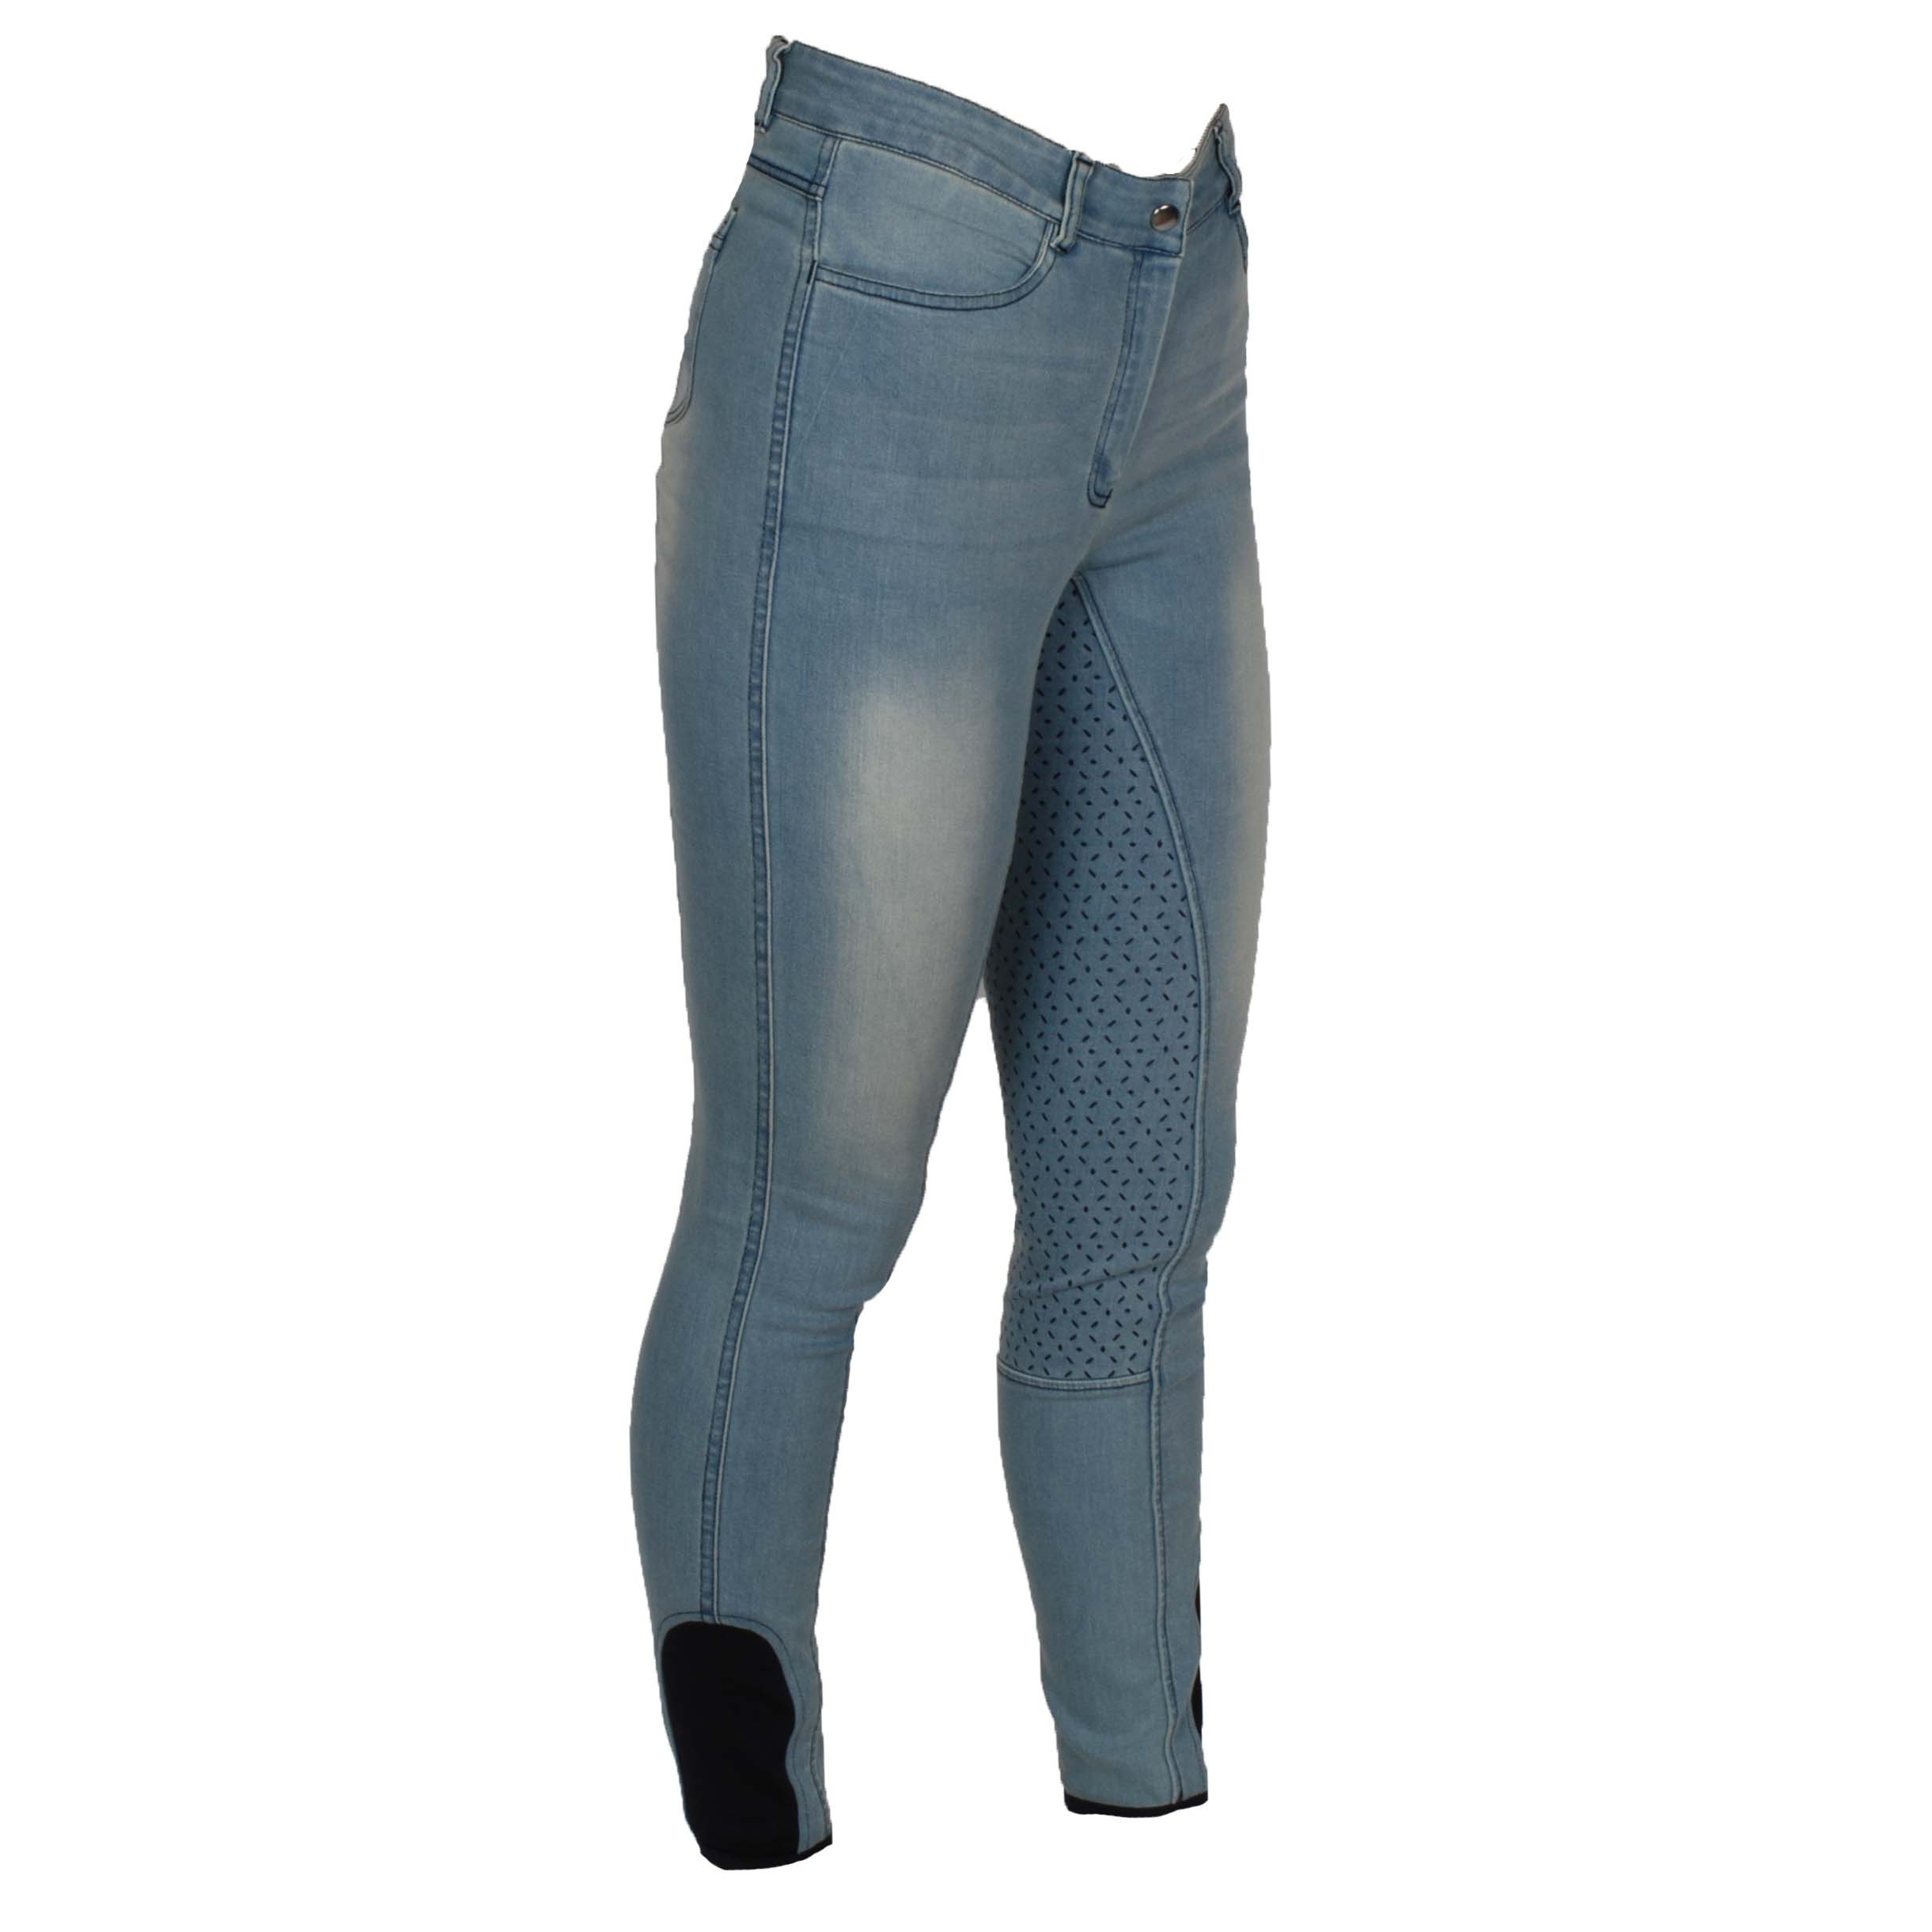 Mondoni Bellville jeans FG rijbroek jeans maat:42